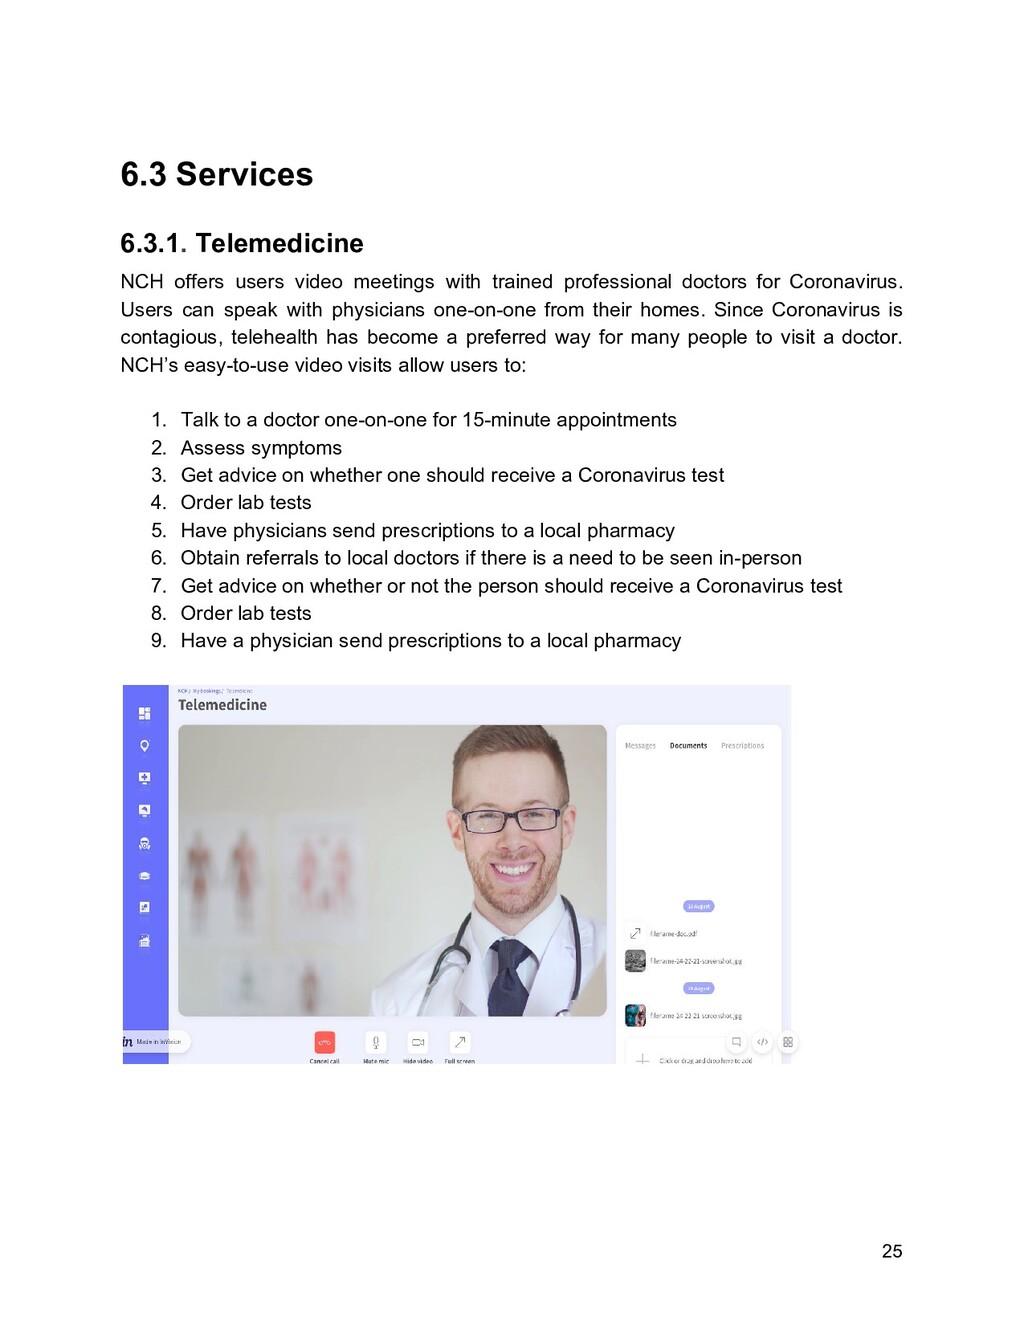 6.3 Services 6.3.1. Telemedicine NCH offers u...